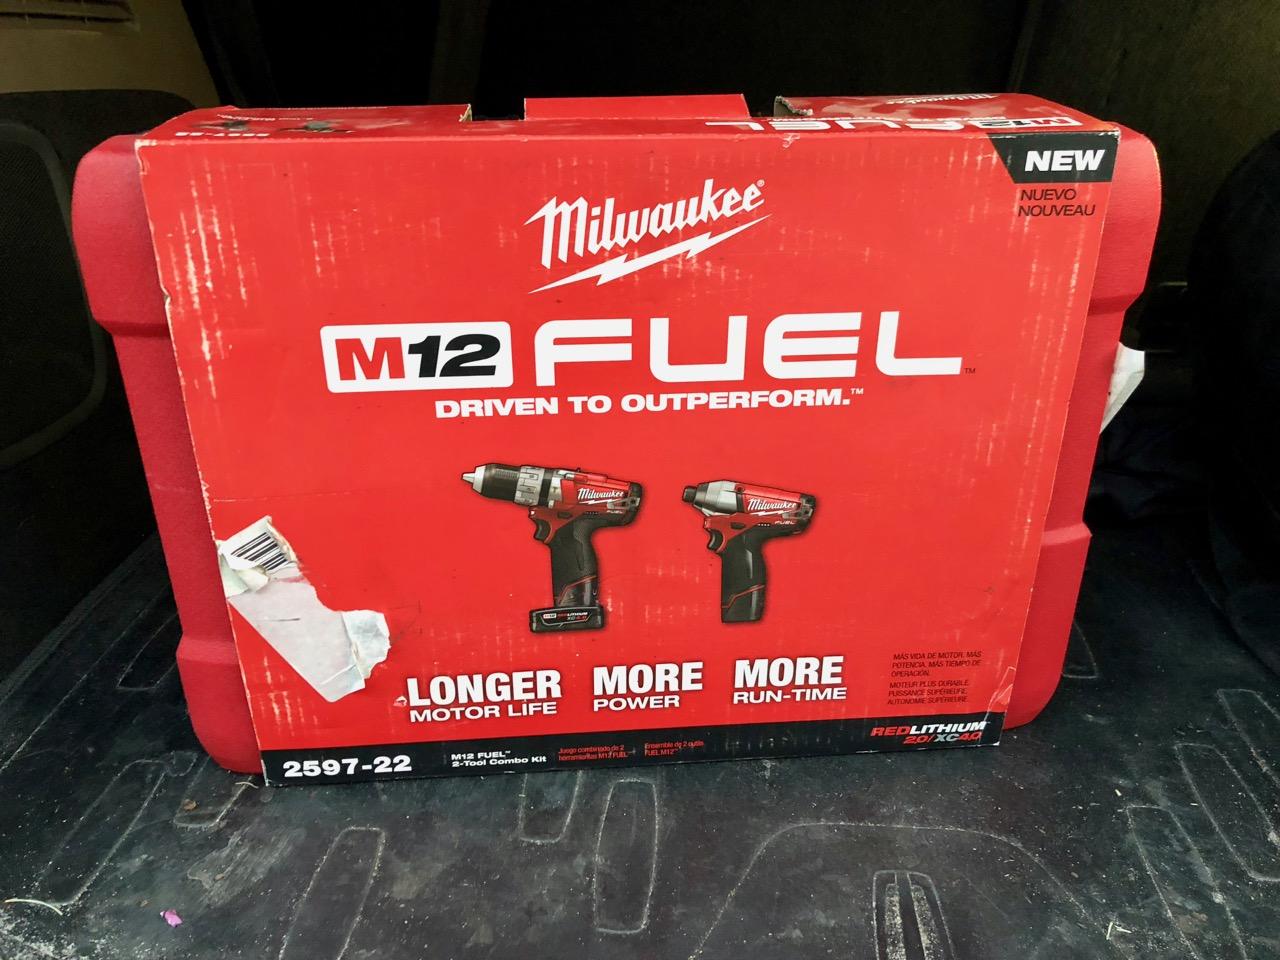 "Milwaukee M12 Fuel 12v Brushless Cordless 1/2"" Hammer Drill & Impact Combo Kit - $135 - Home Depot B&M - YMMV"